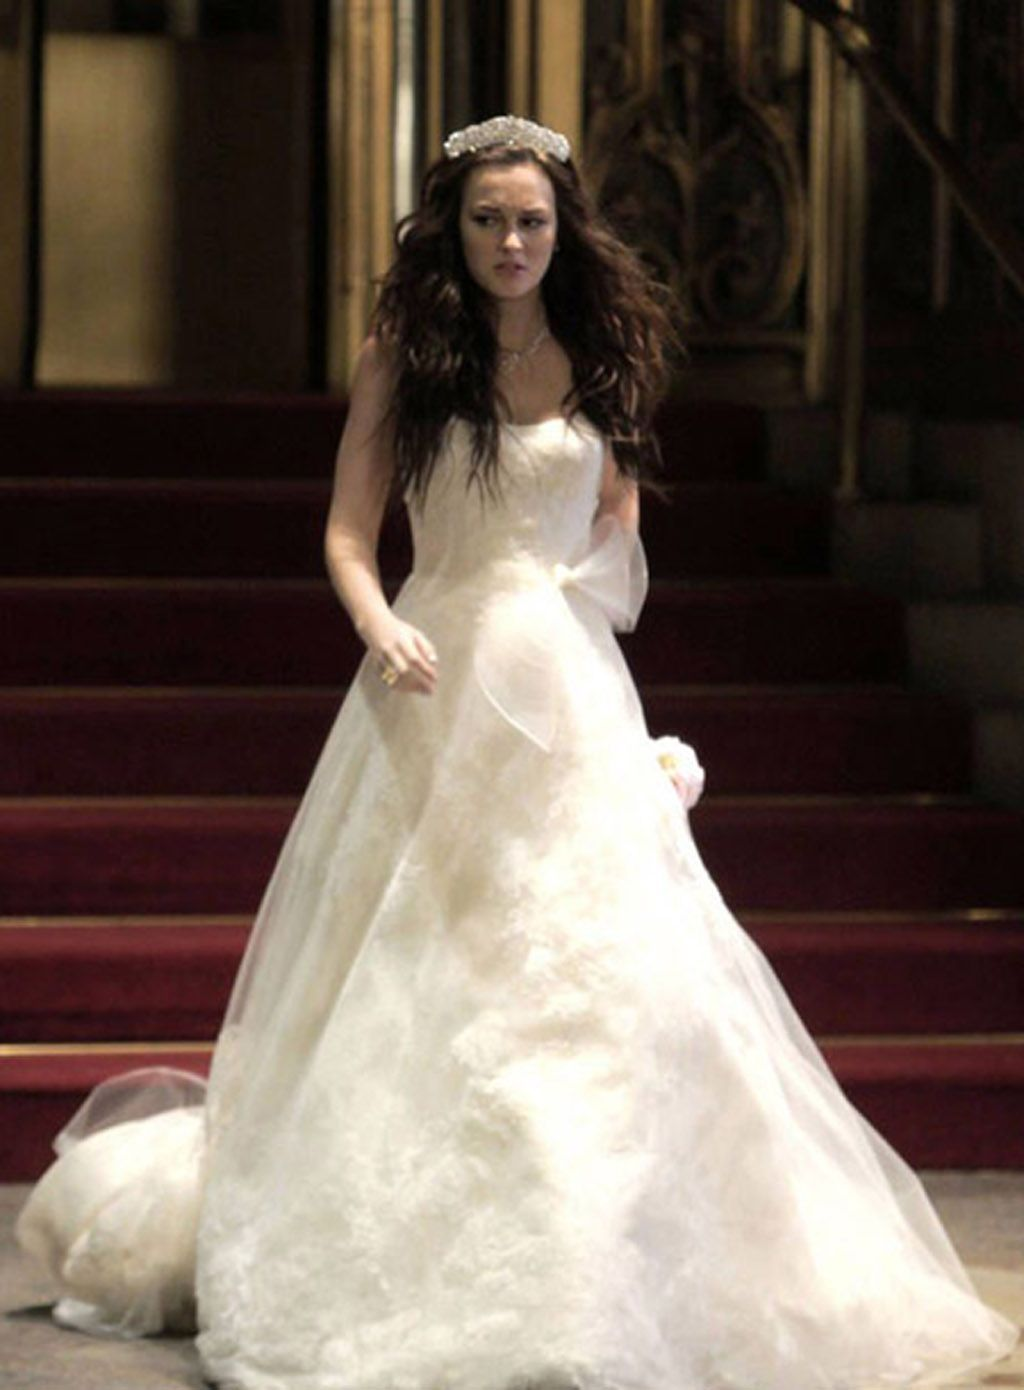 Girls wedding dress  Vera Wang  Blairus Gossip girl wedding dress  Wedding Inspo